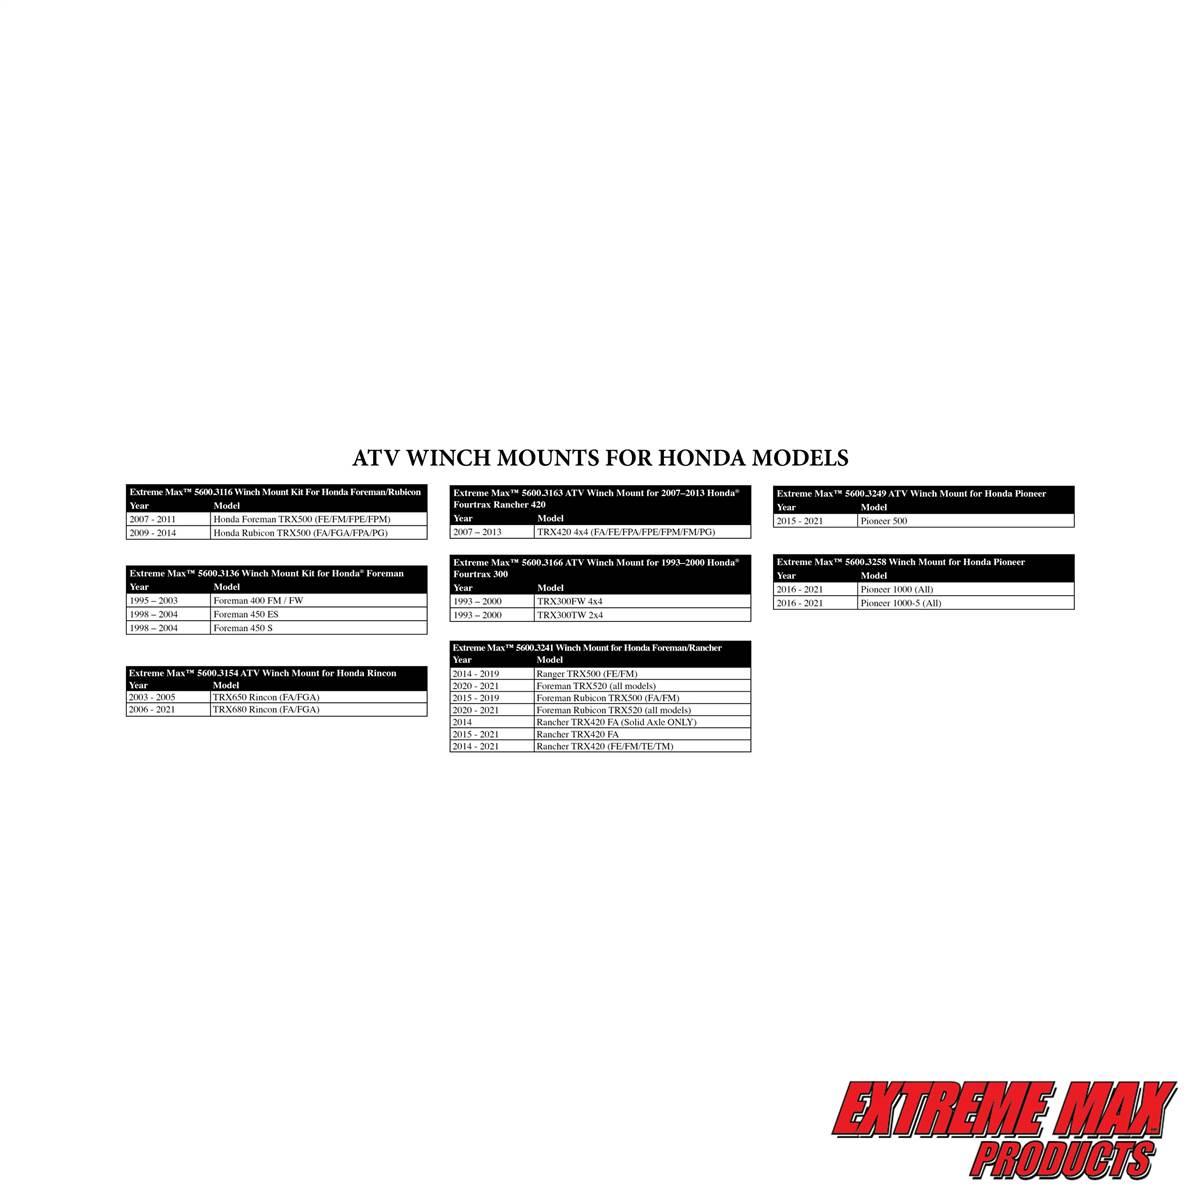 1998 Honda Foreman Wiring Diagram | Wiring Liry on